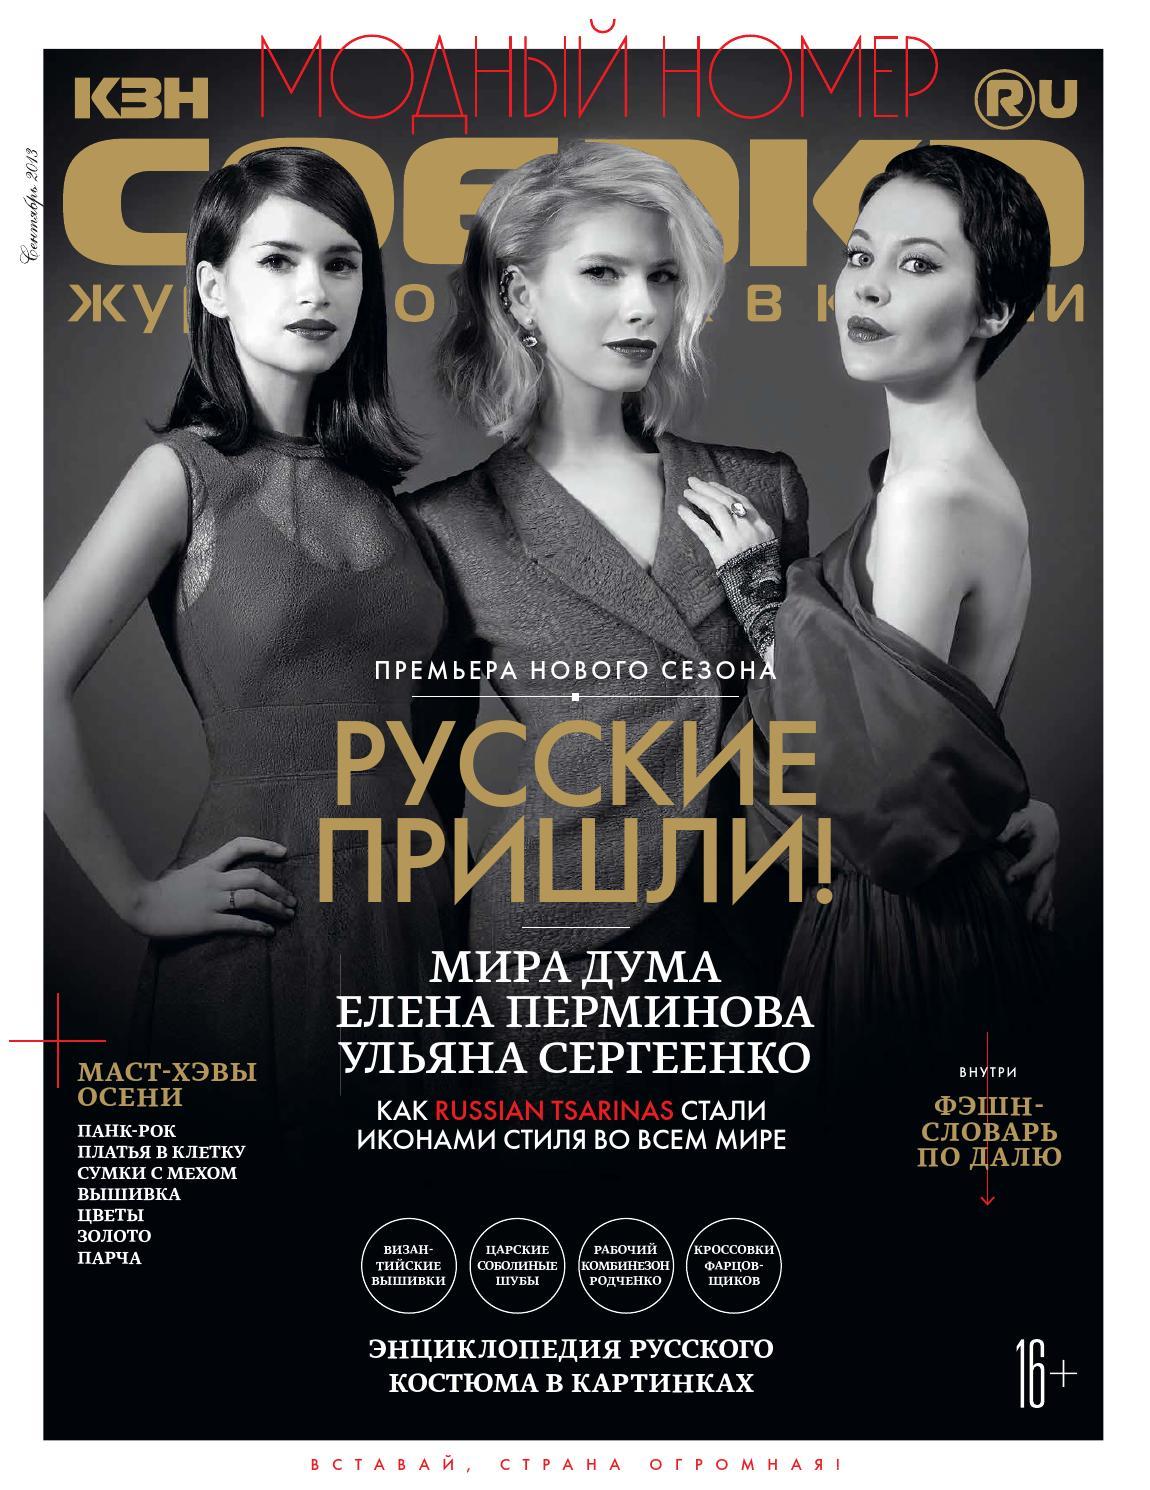 Kzn sobaka ru sept2013 by kzn.sobaka.ru - issuu a6a74540d74